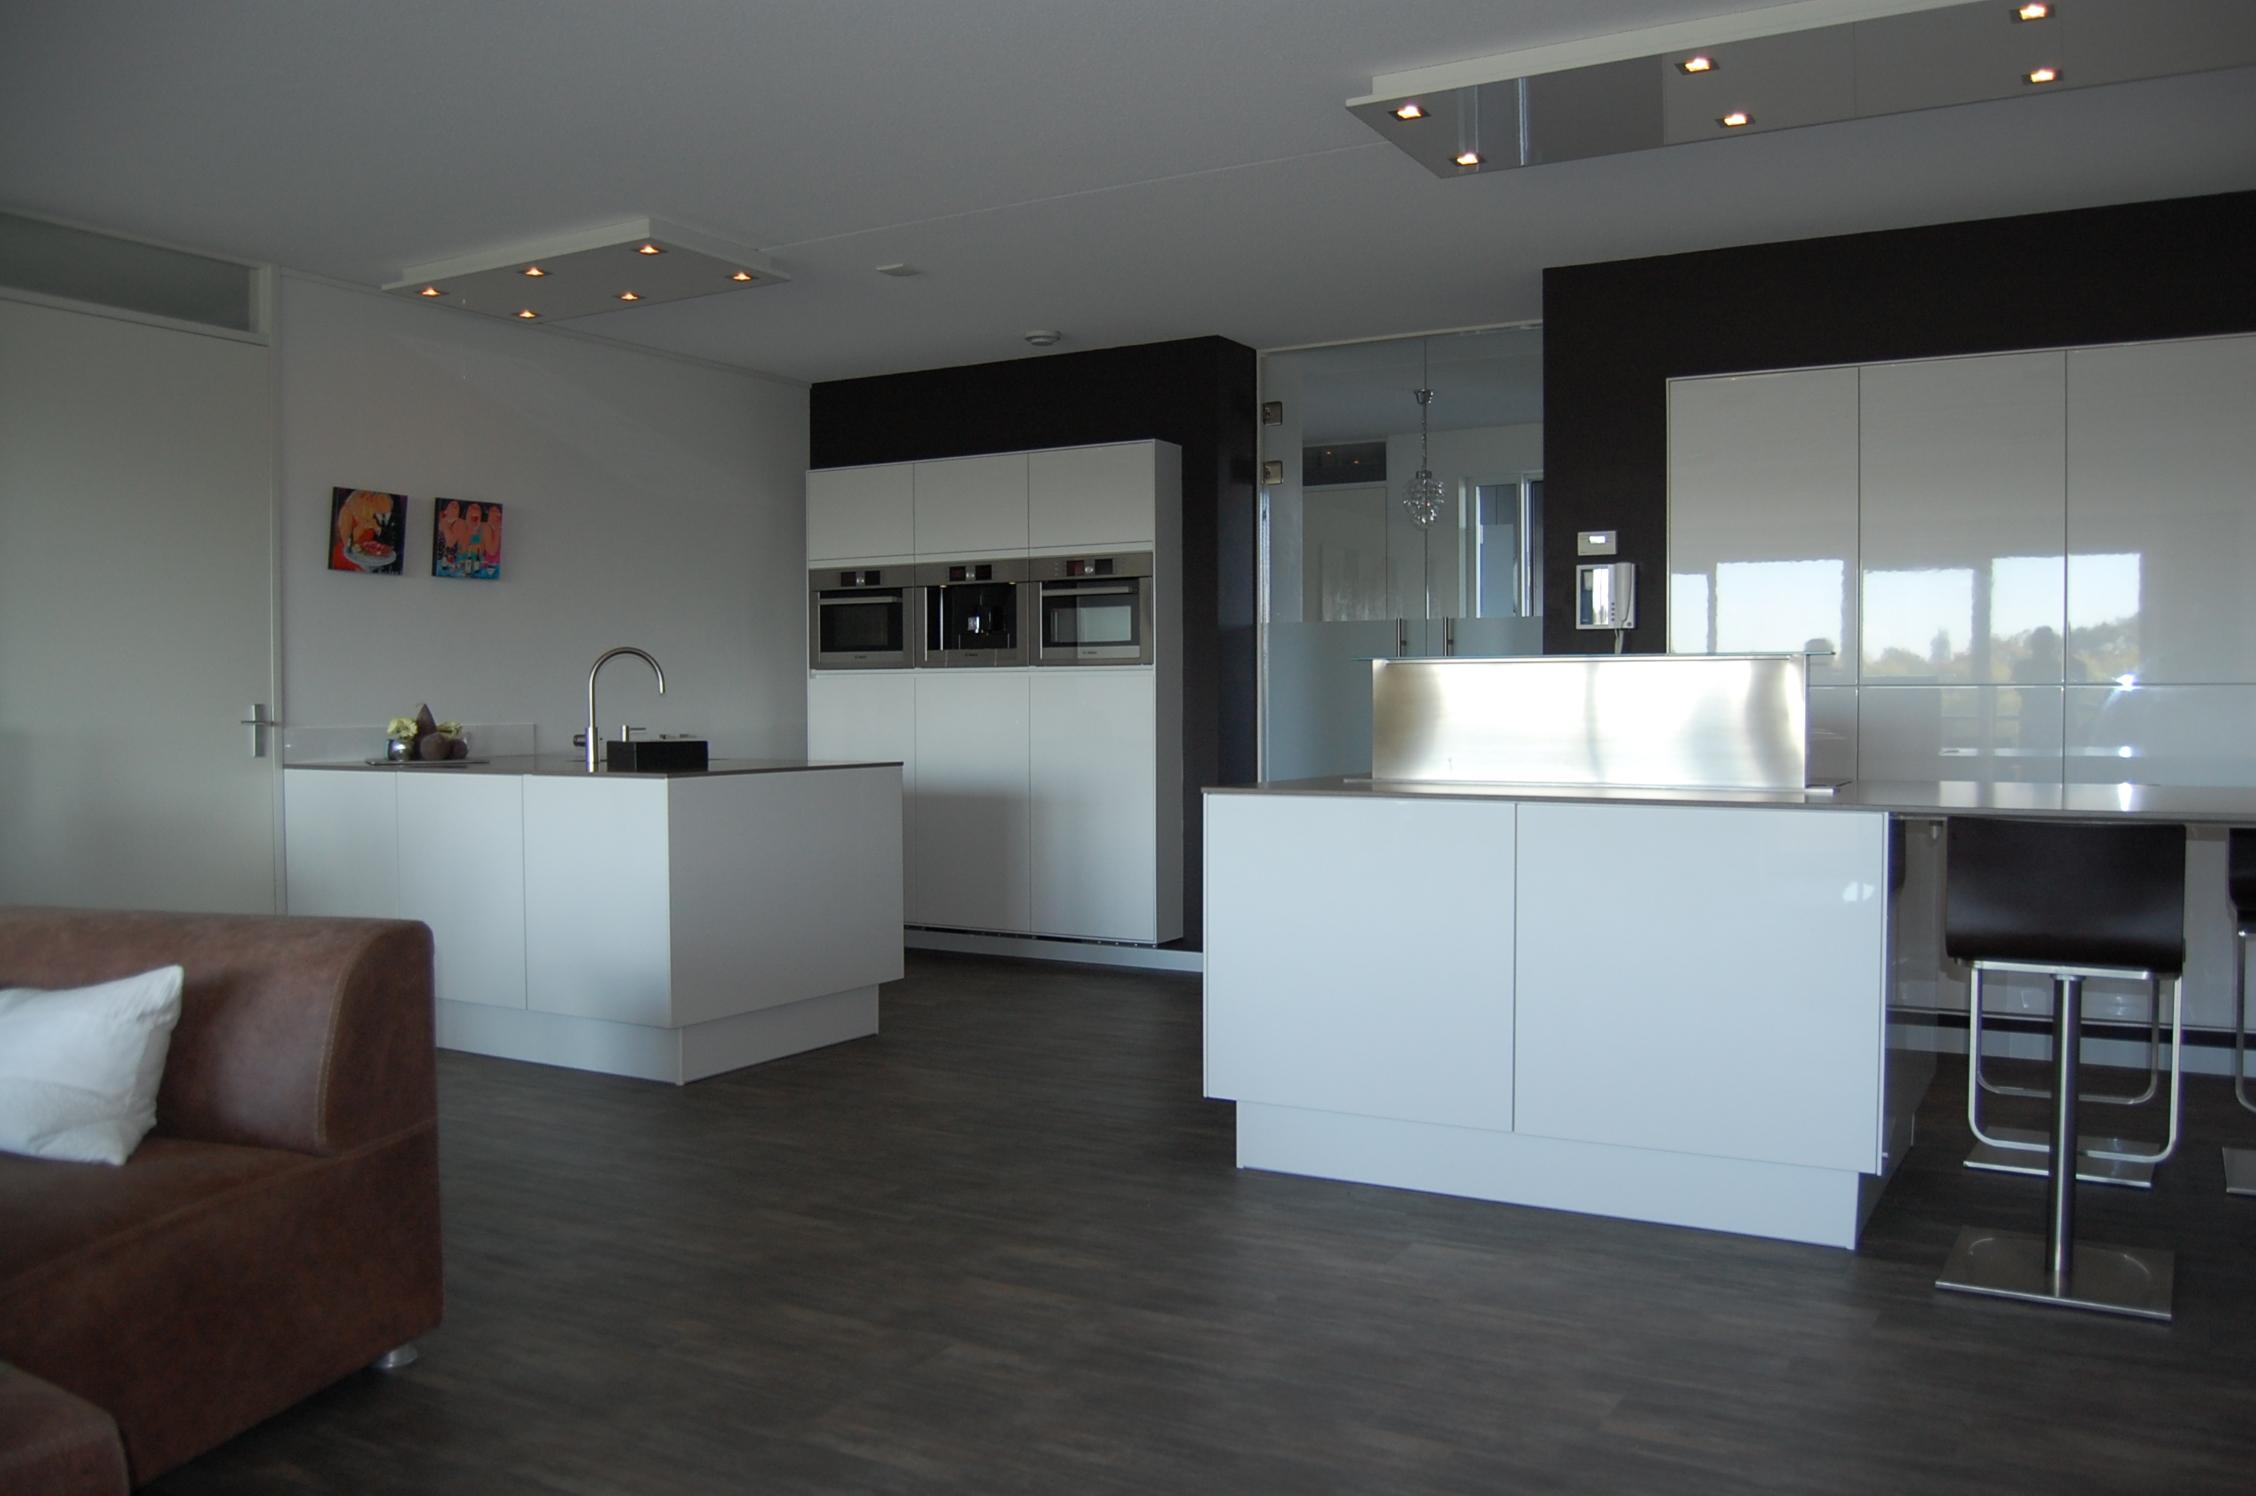 Hl keukens en kasten gespecialiseerd in maatwerk en design - Groene en witte keuken ...